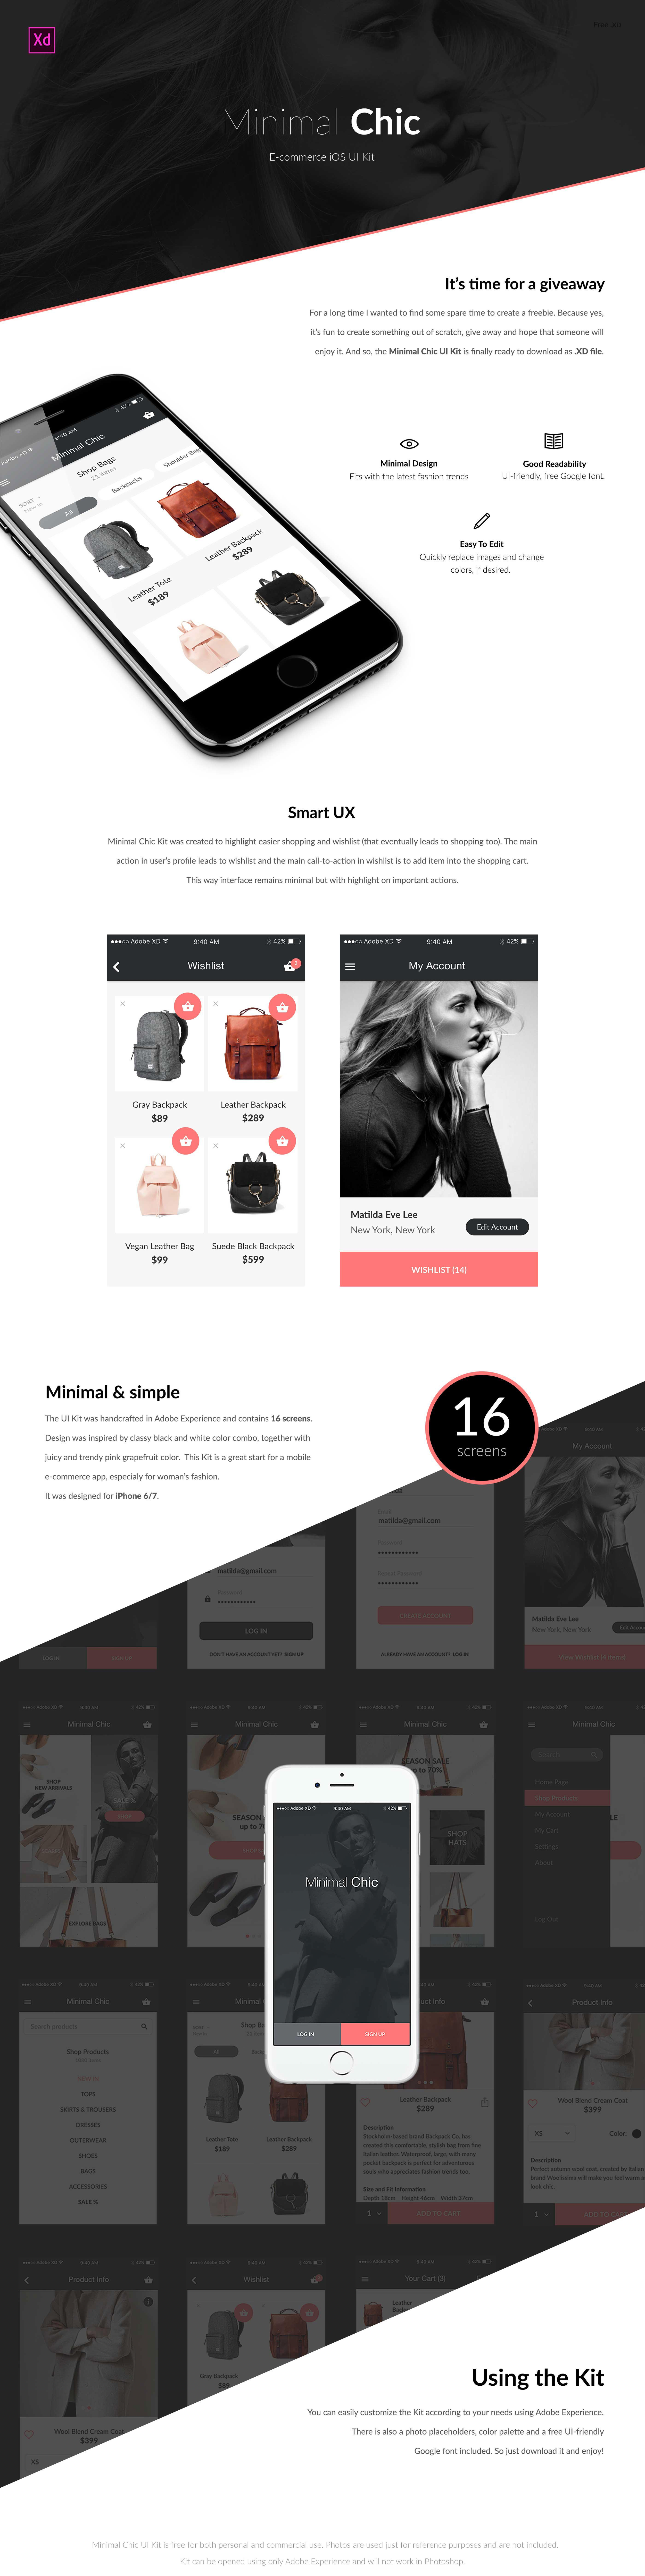 Minimal Chic - Free UI Kit - Contains 16 screens - a good base to kickstart an online shop concept